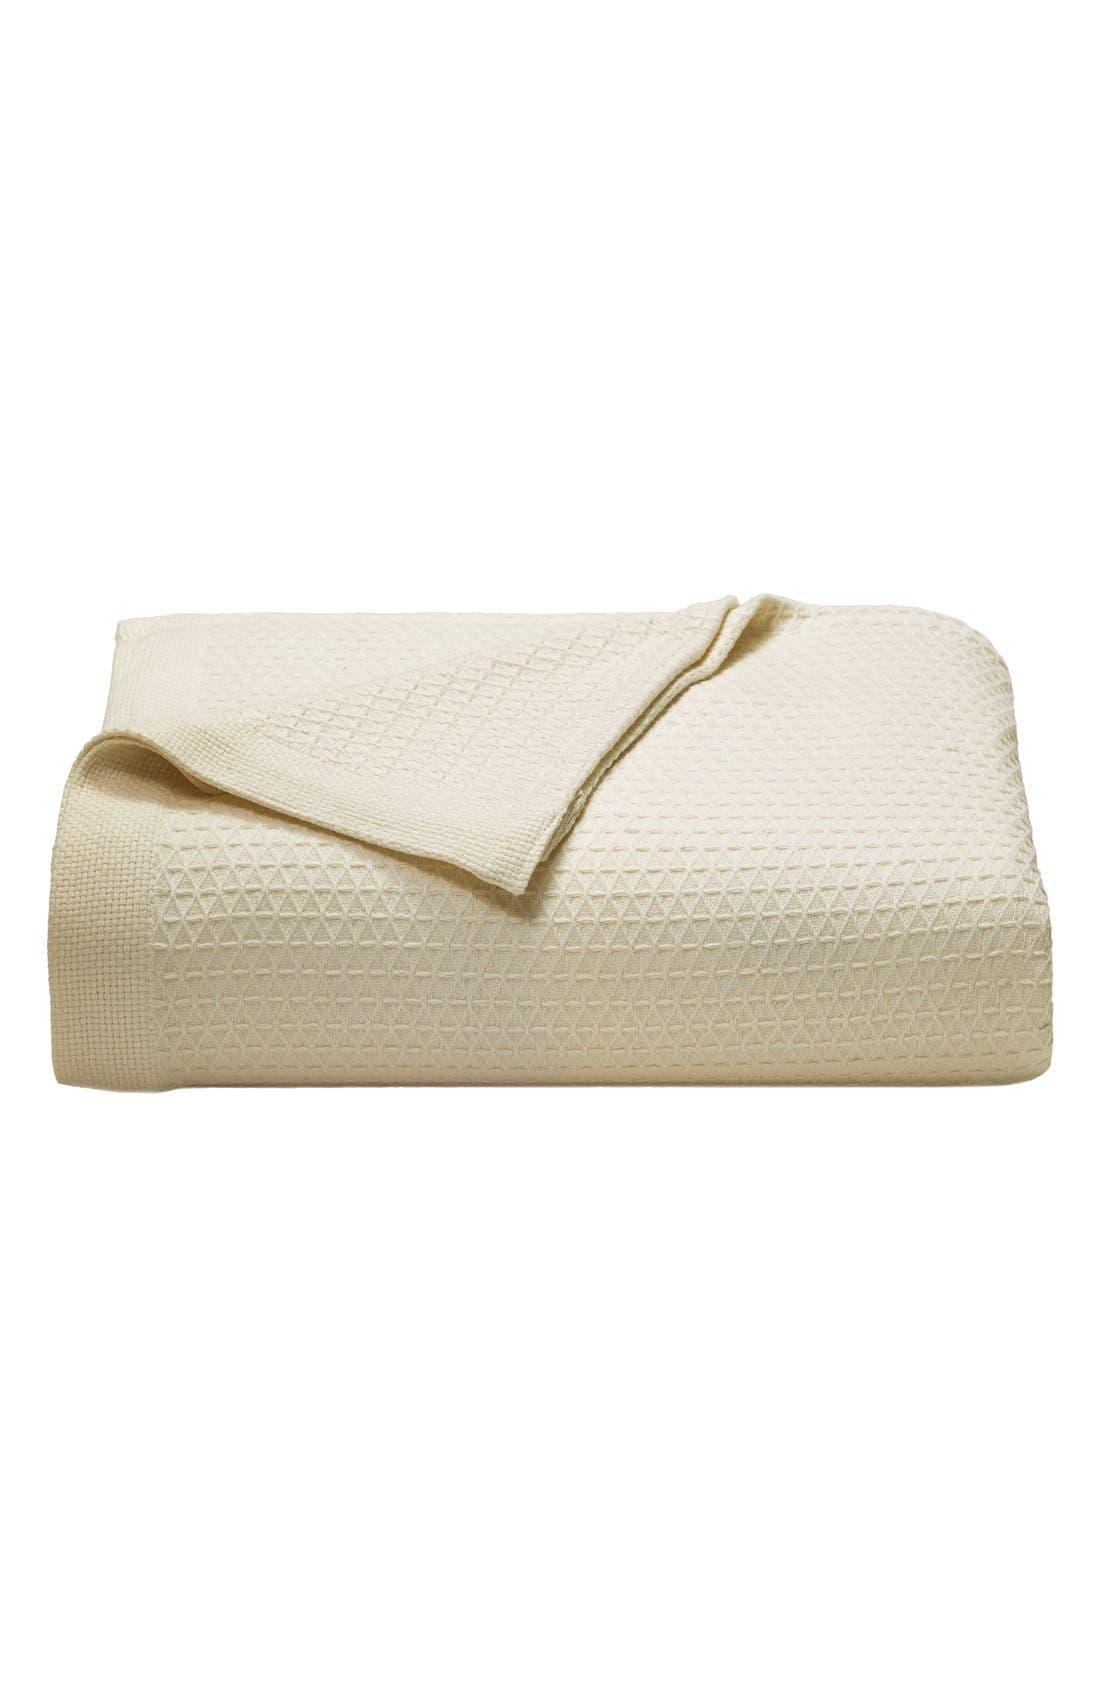 Nautica 'Baird' Cotton Blanket